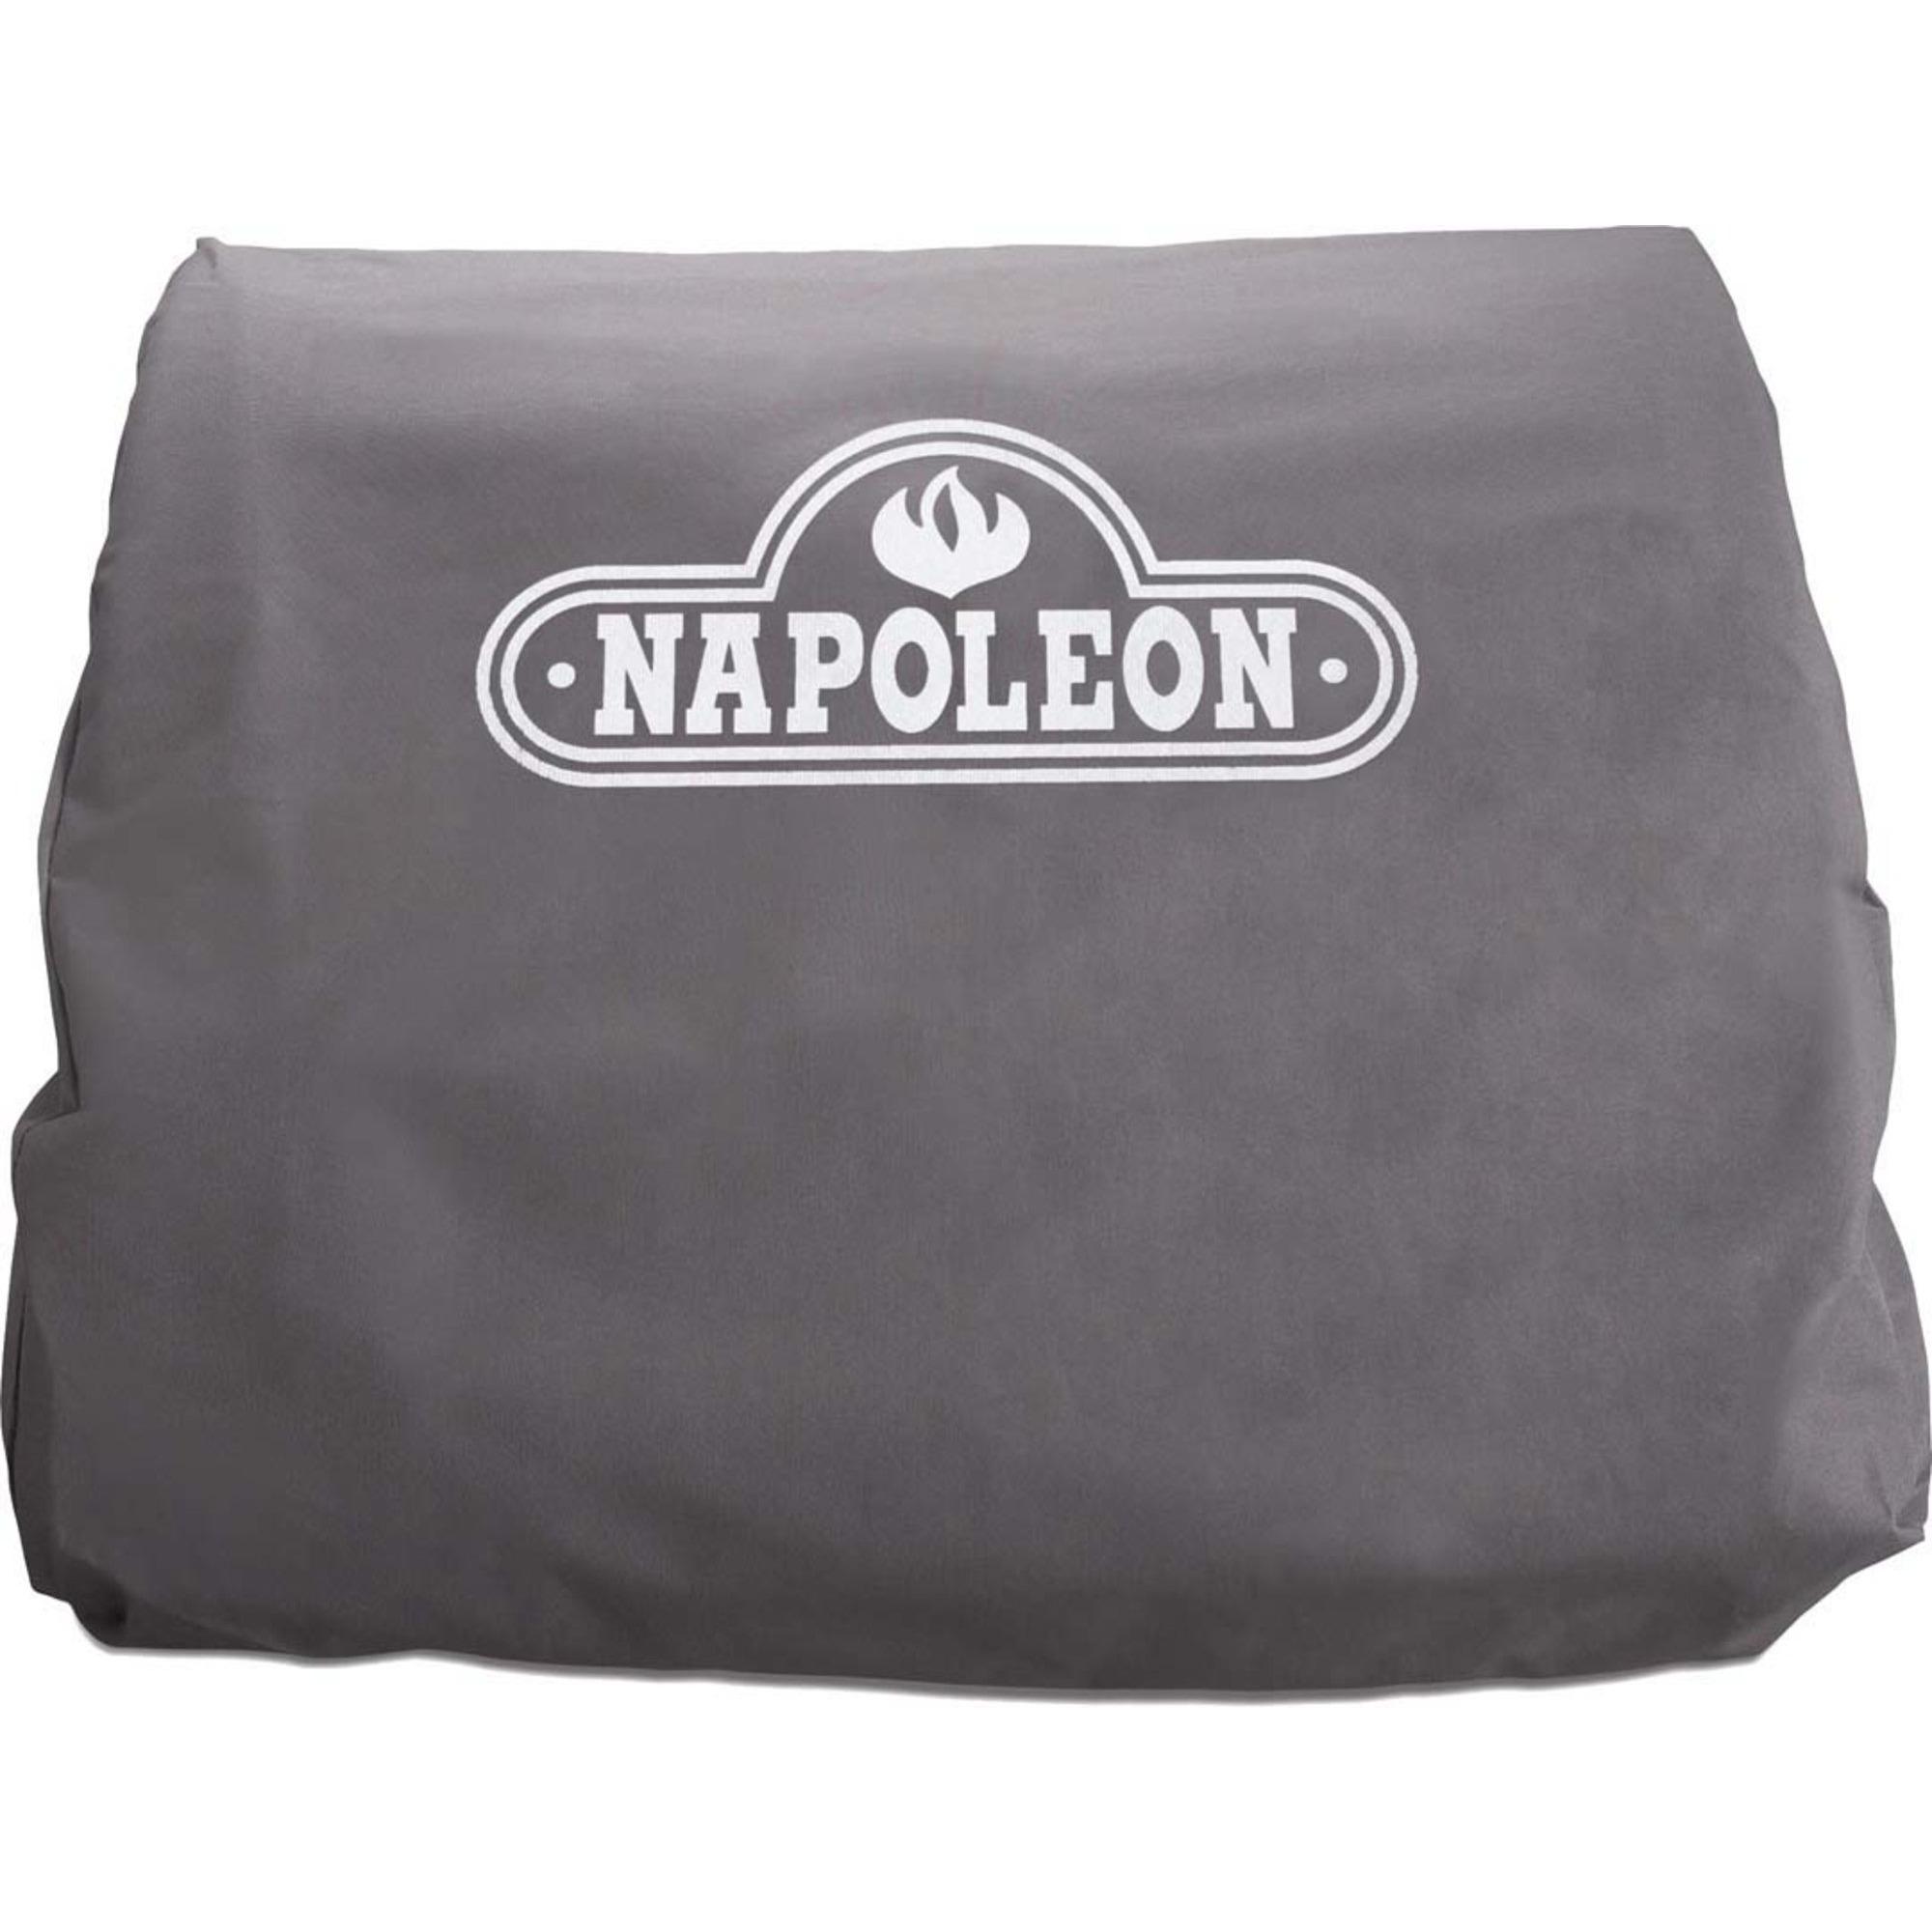 Napoleon Överdrag BILEX605